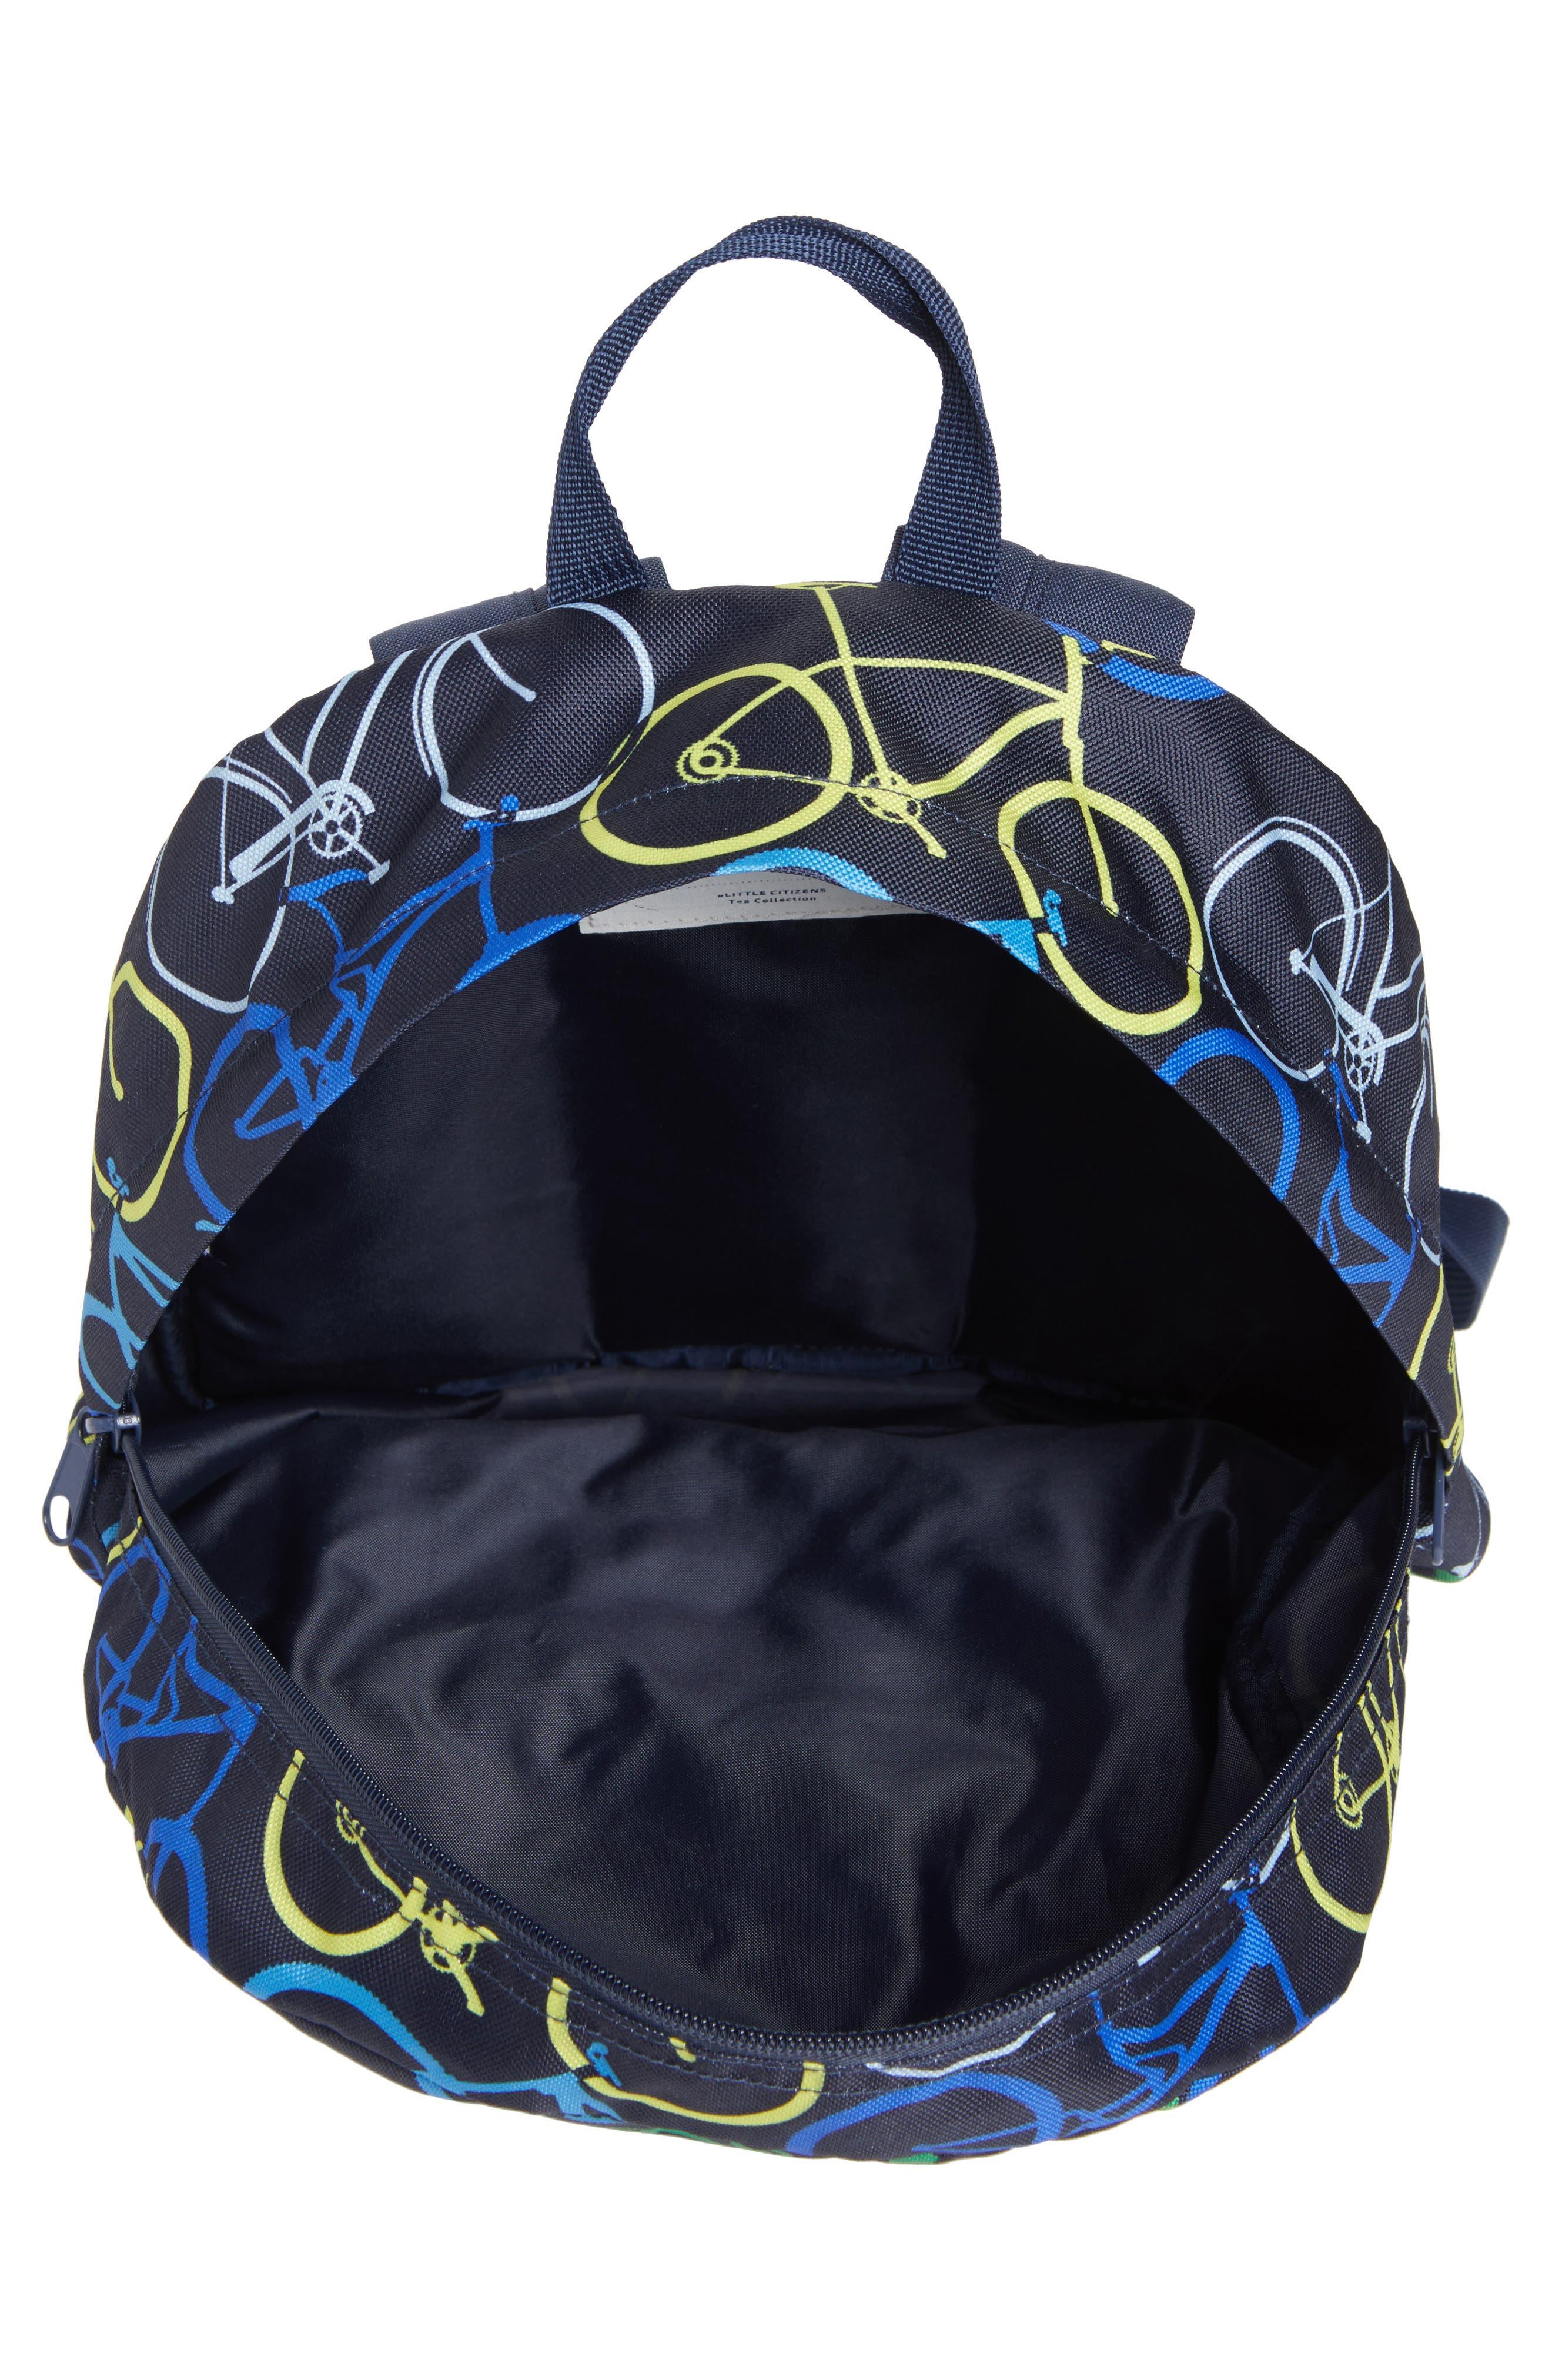 Flying Scot Backpack,                             Alternate thumbnail 3, color,                             411